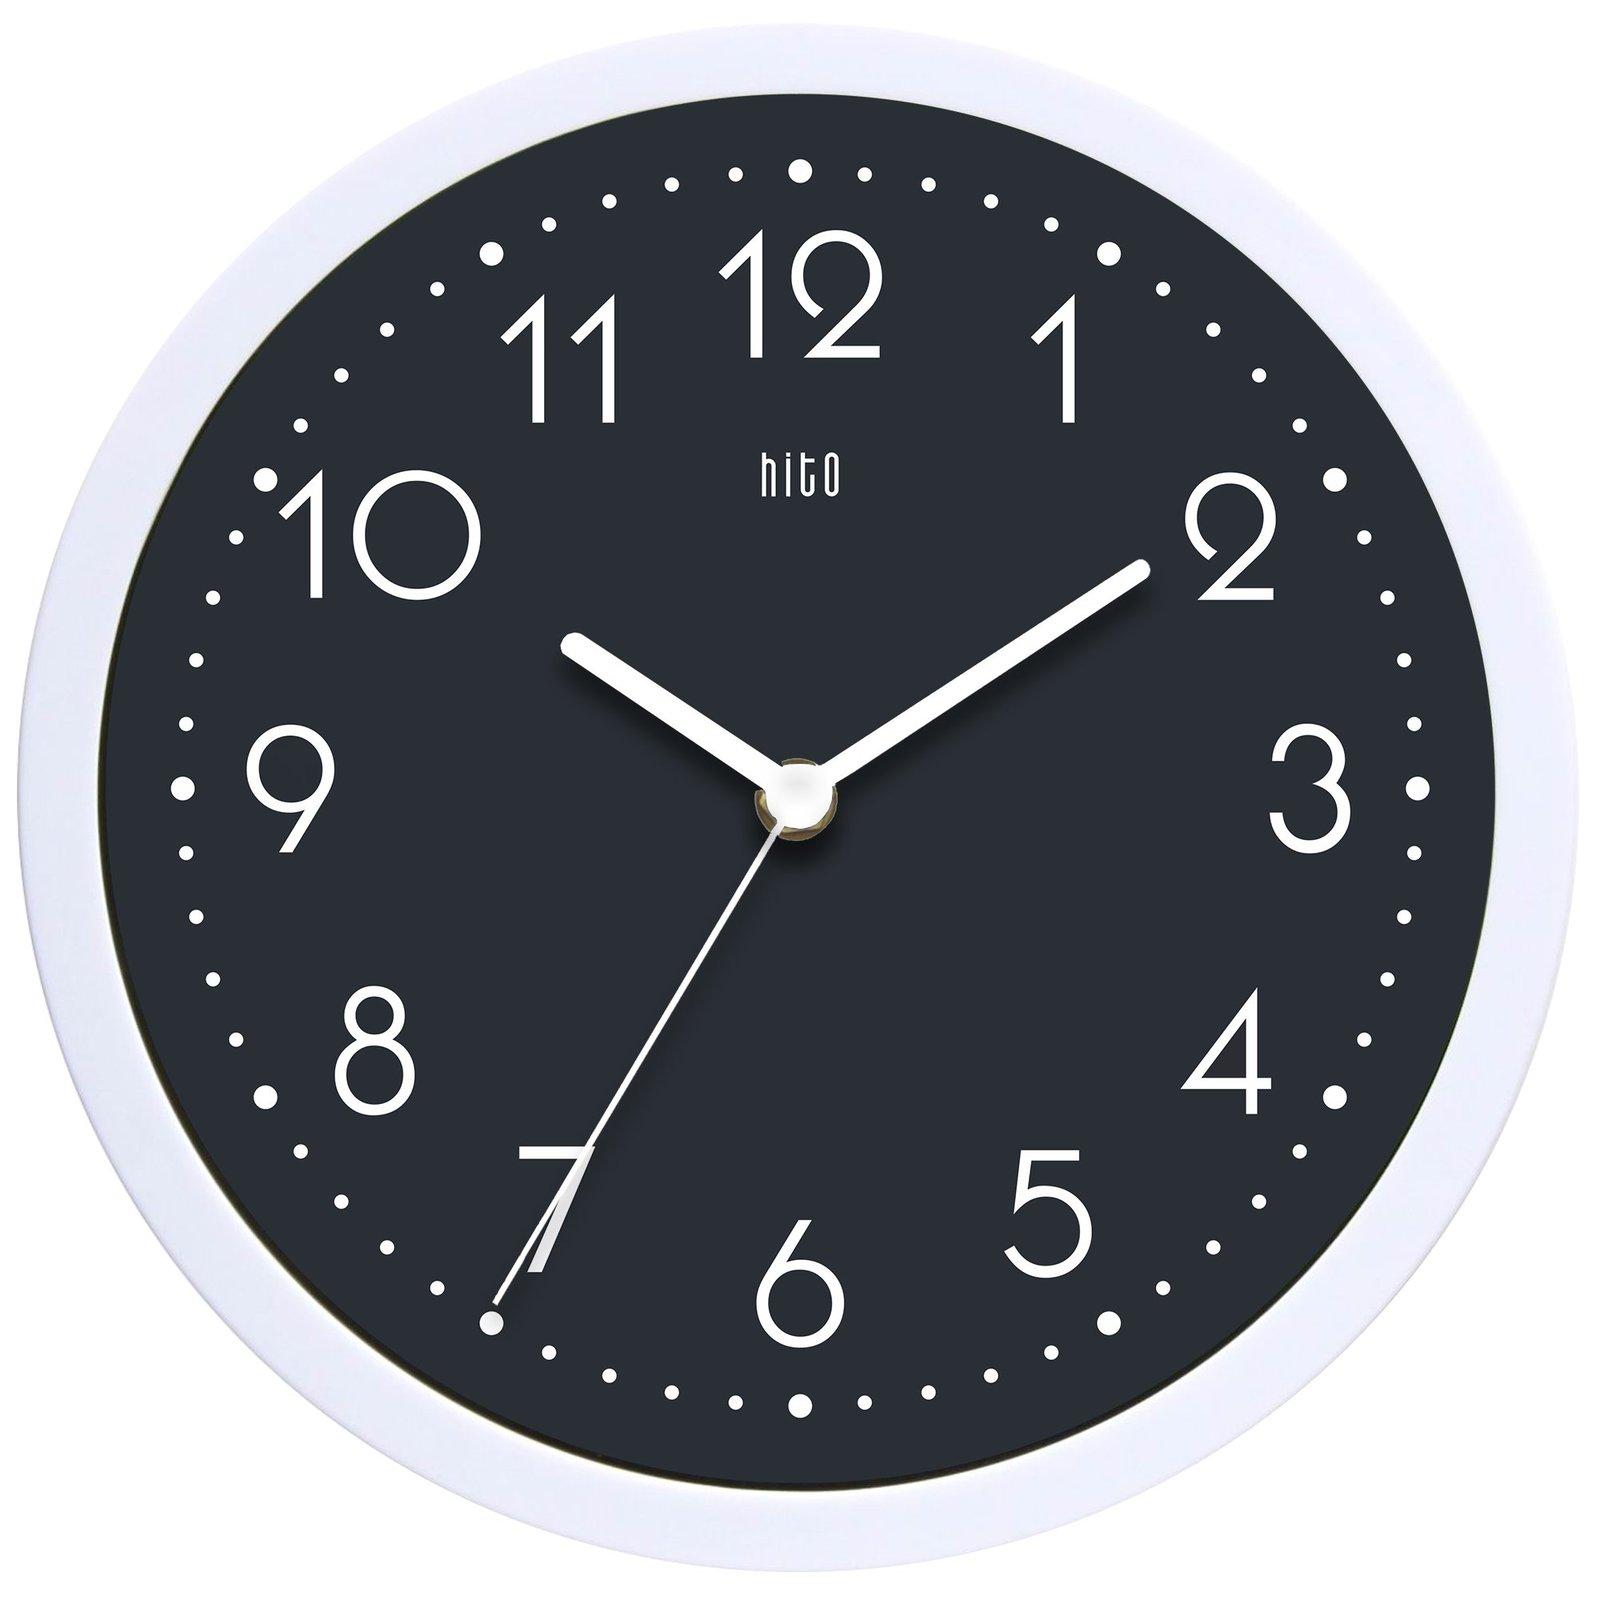 Super Silent Wall Clock |Silent Wall Clock